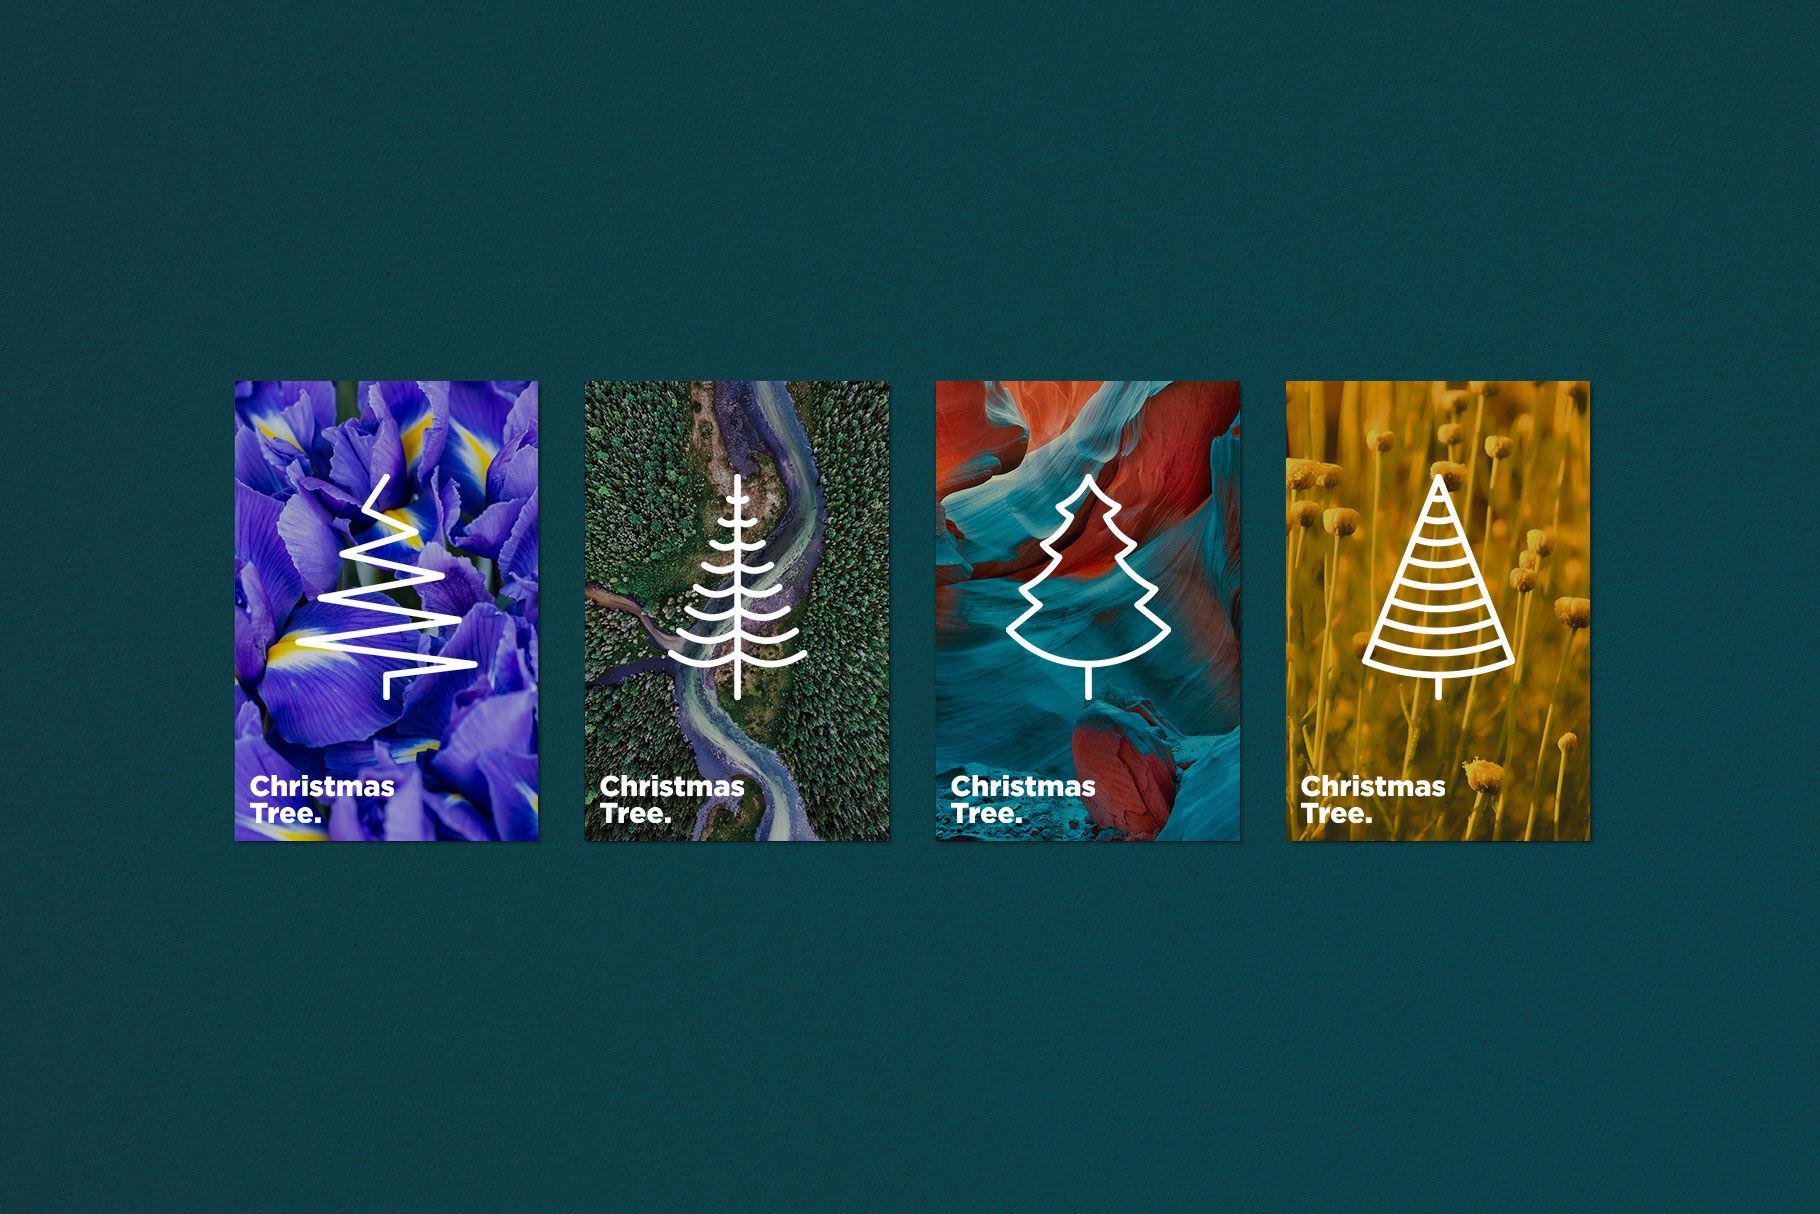 Christmas Tree 16 Thin Line Icons Set By Alexey Blogoodf